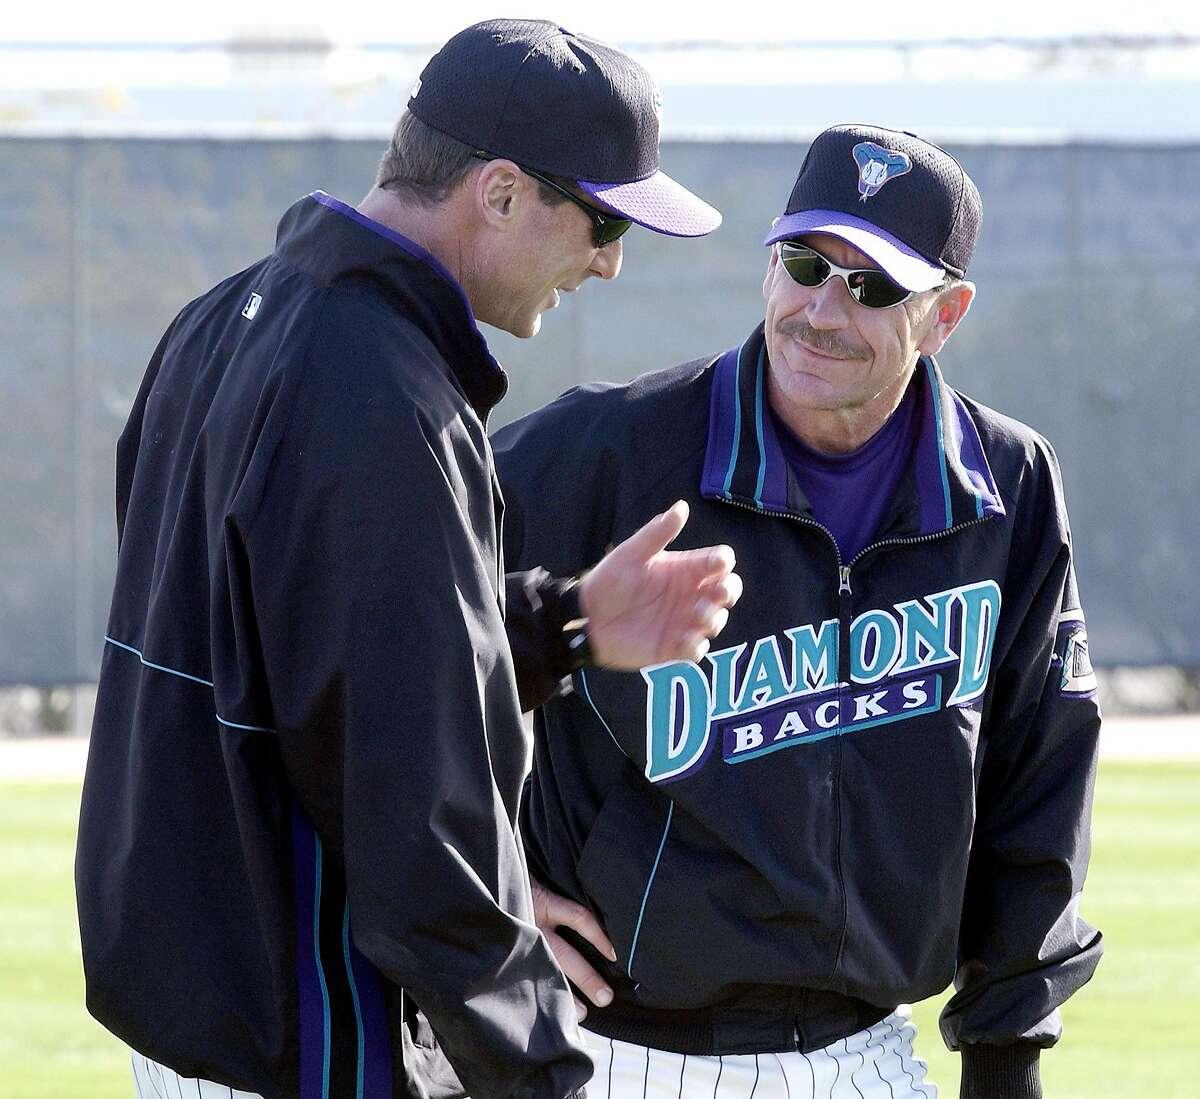 Arizona Diamondbacks' bench coach Bob Melvin (3), left, talks with manager Bob Brenly (15) during spring training workouts on Sunday, Feb. 17,2002 in Tucson, Ariz. (AP Photo/Jon Hayt)